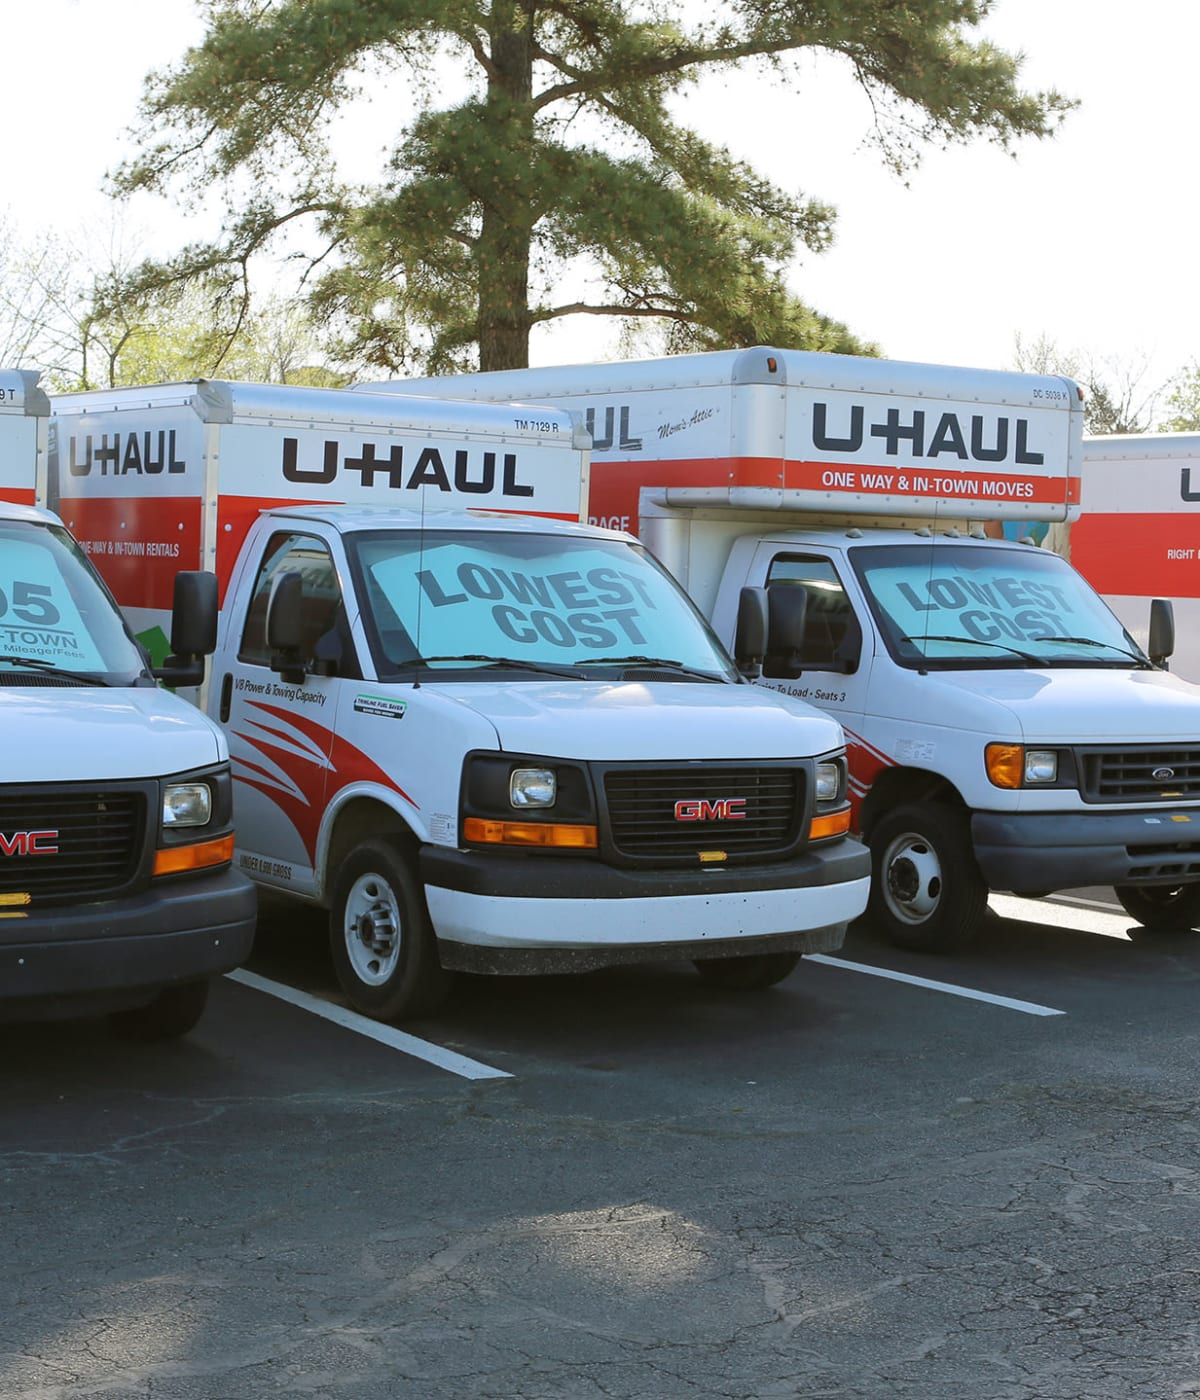 Midgard Self Storage in Statesboro, Georgia, has moving trucks for rent